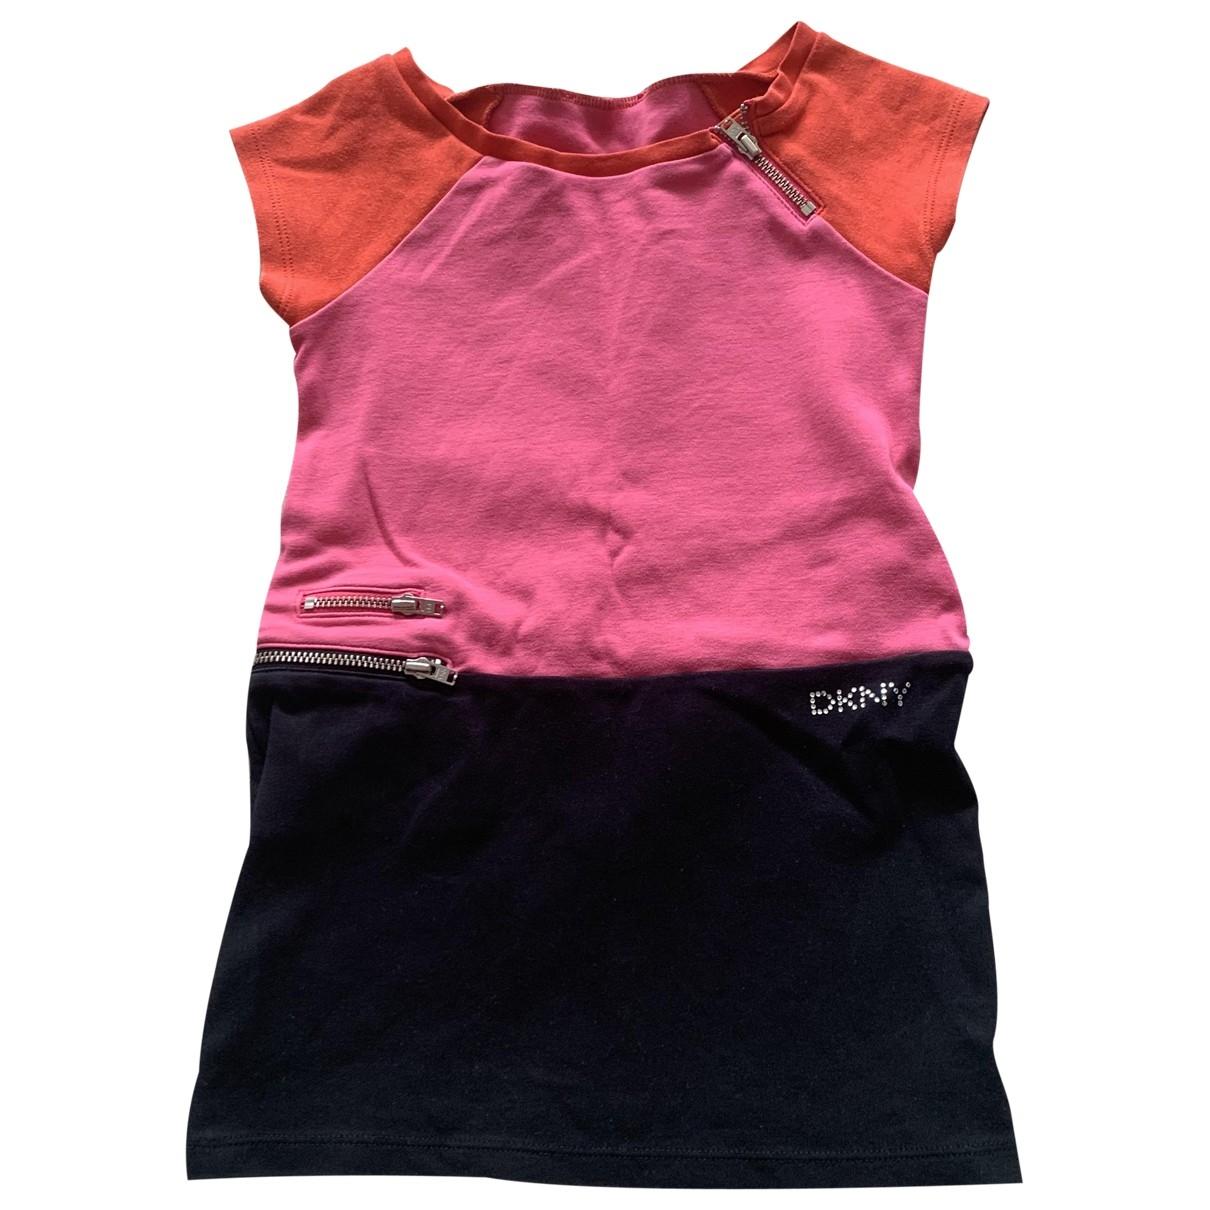 Dkny - Robe    pour enfant en coton - elasthane - rose